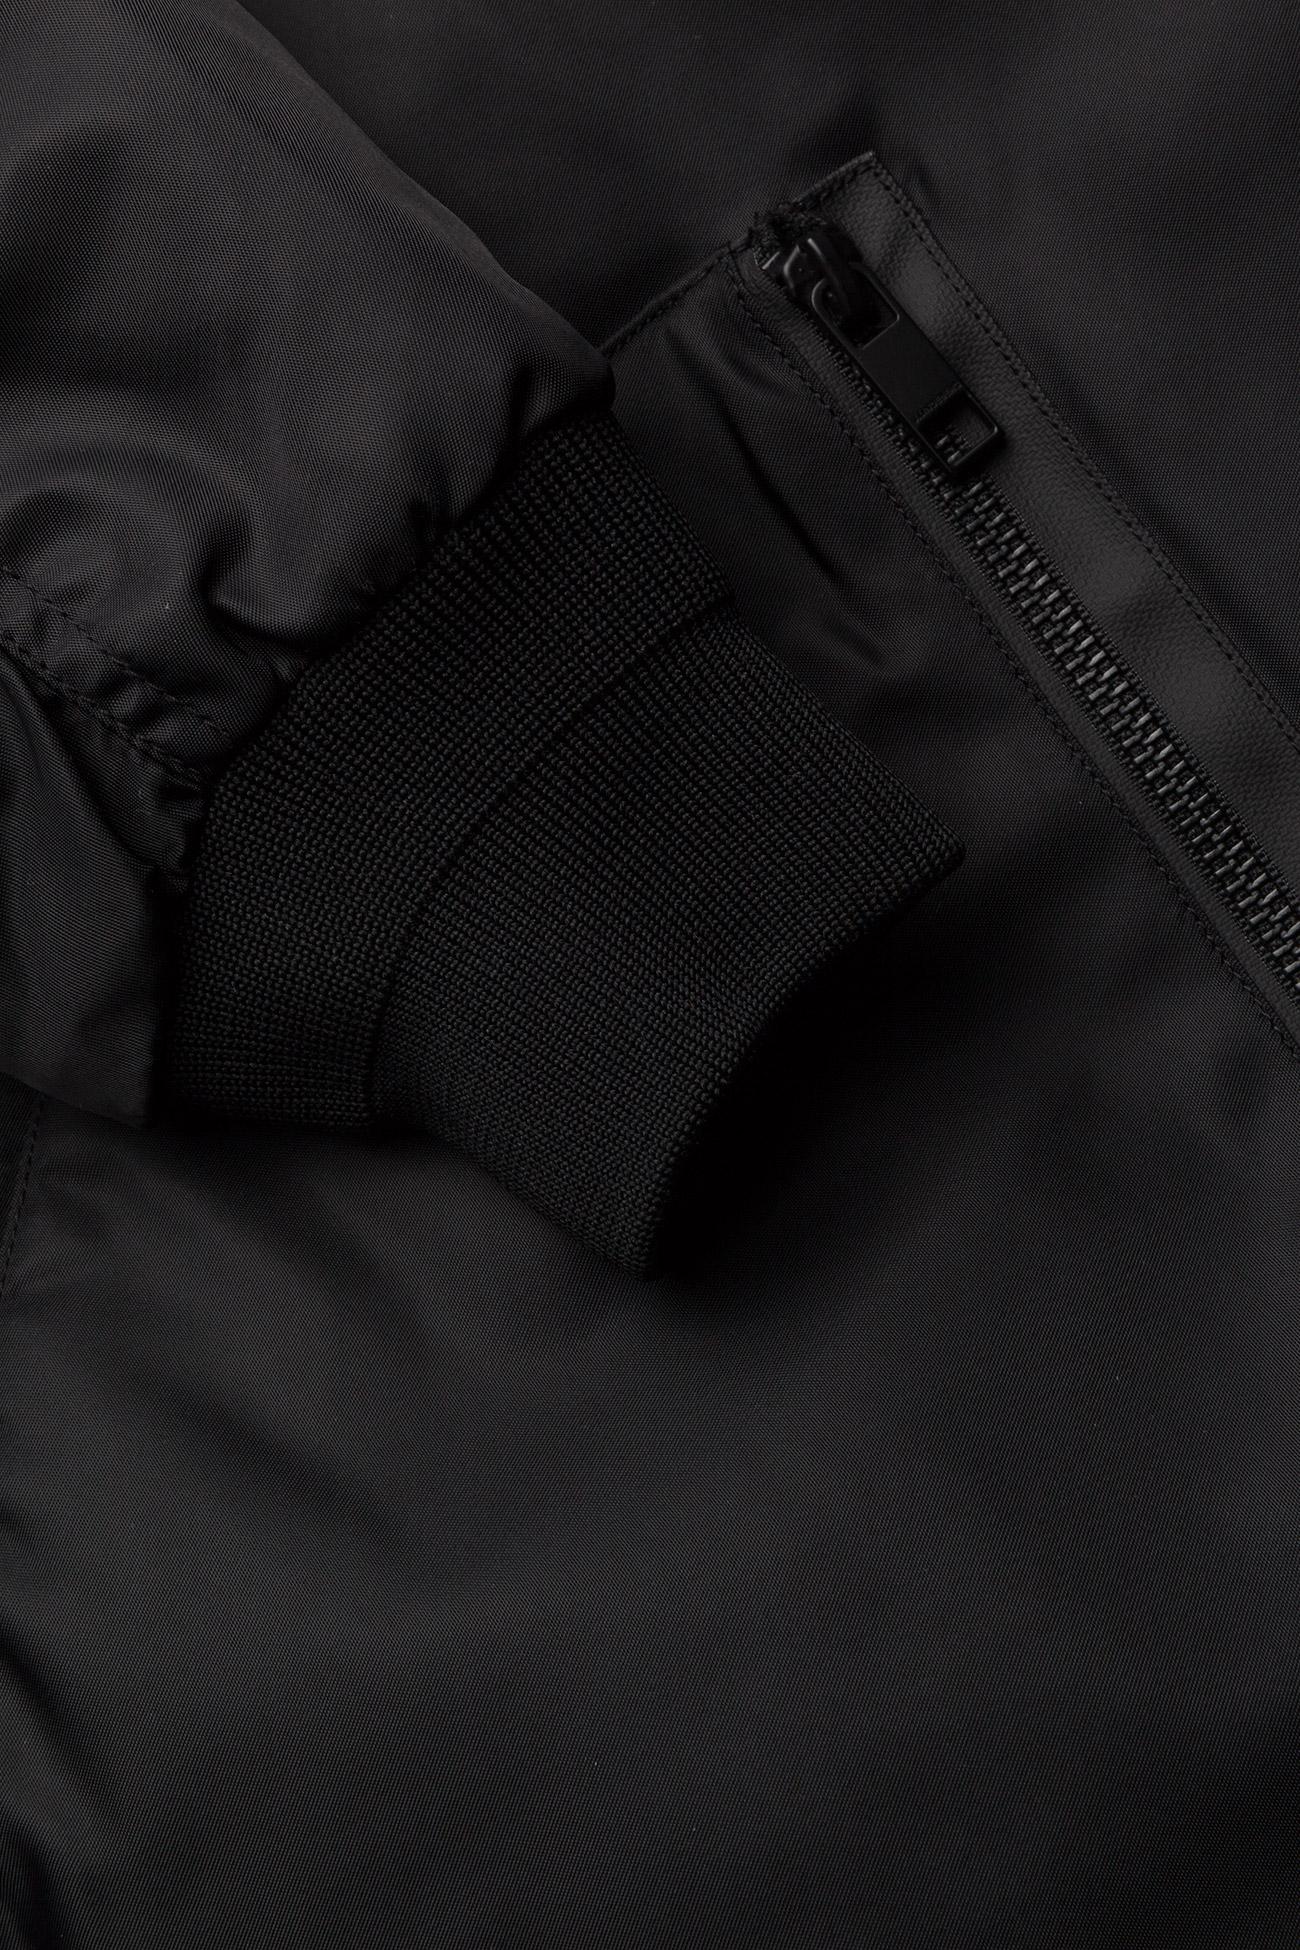 J. Lindeberg Hill 76 Muted Nylon - Jackor & Rockar Black